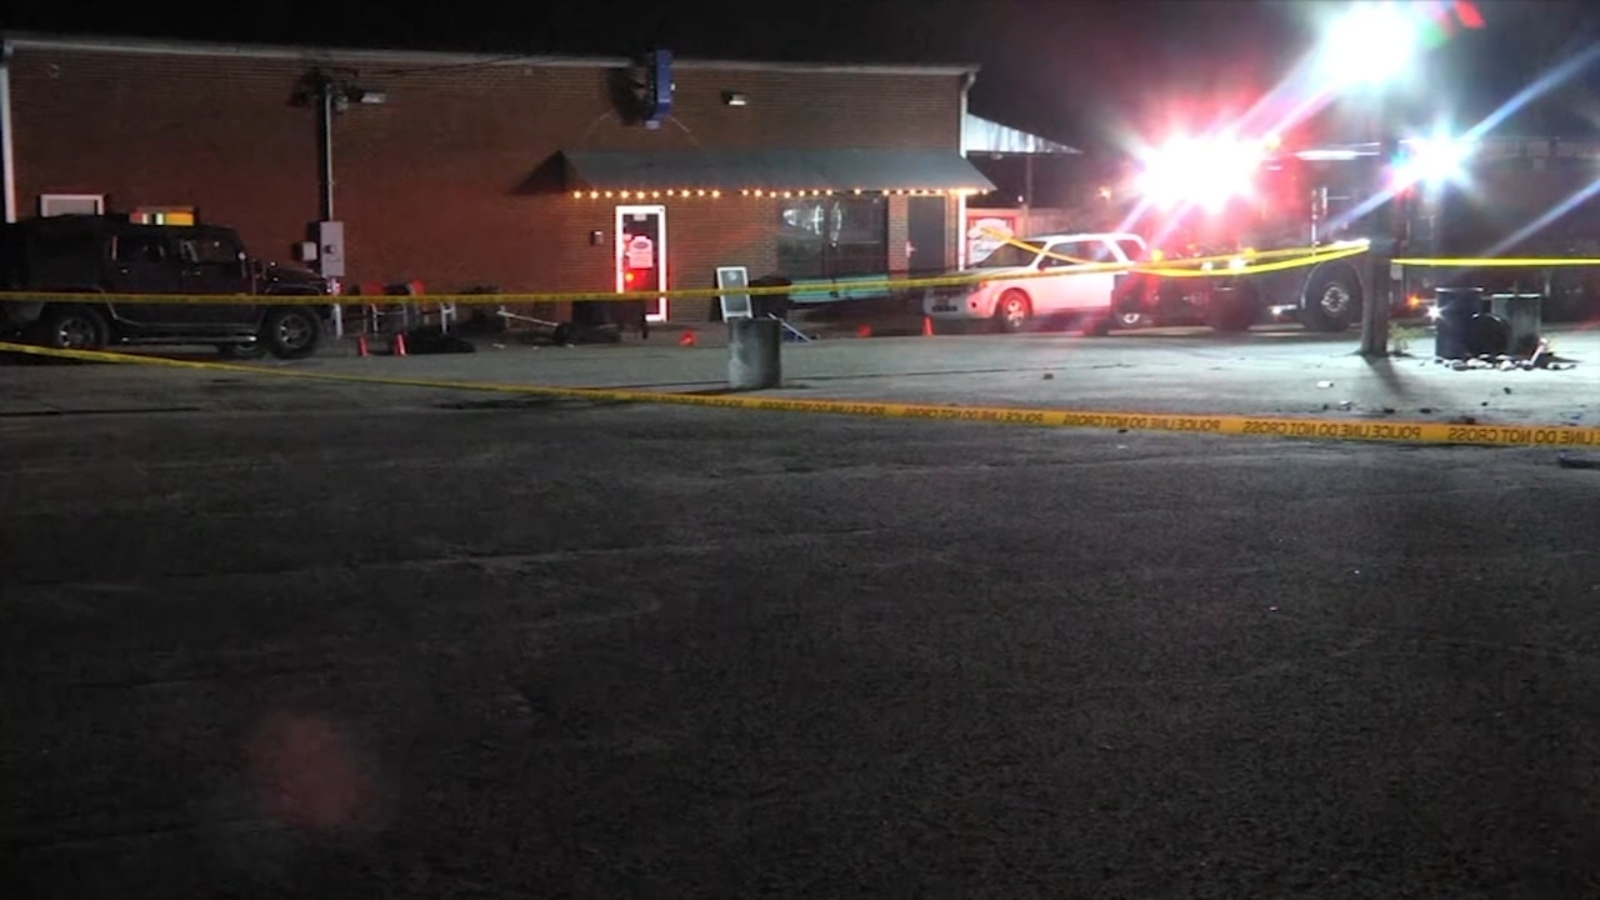 2 dead, 7 injured in South Carolina bar shooting 1